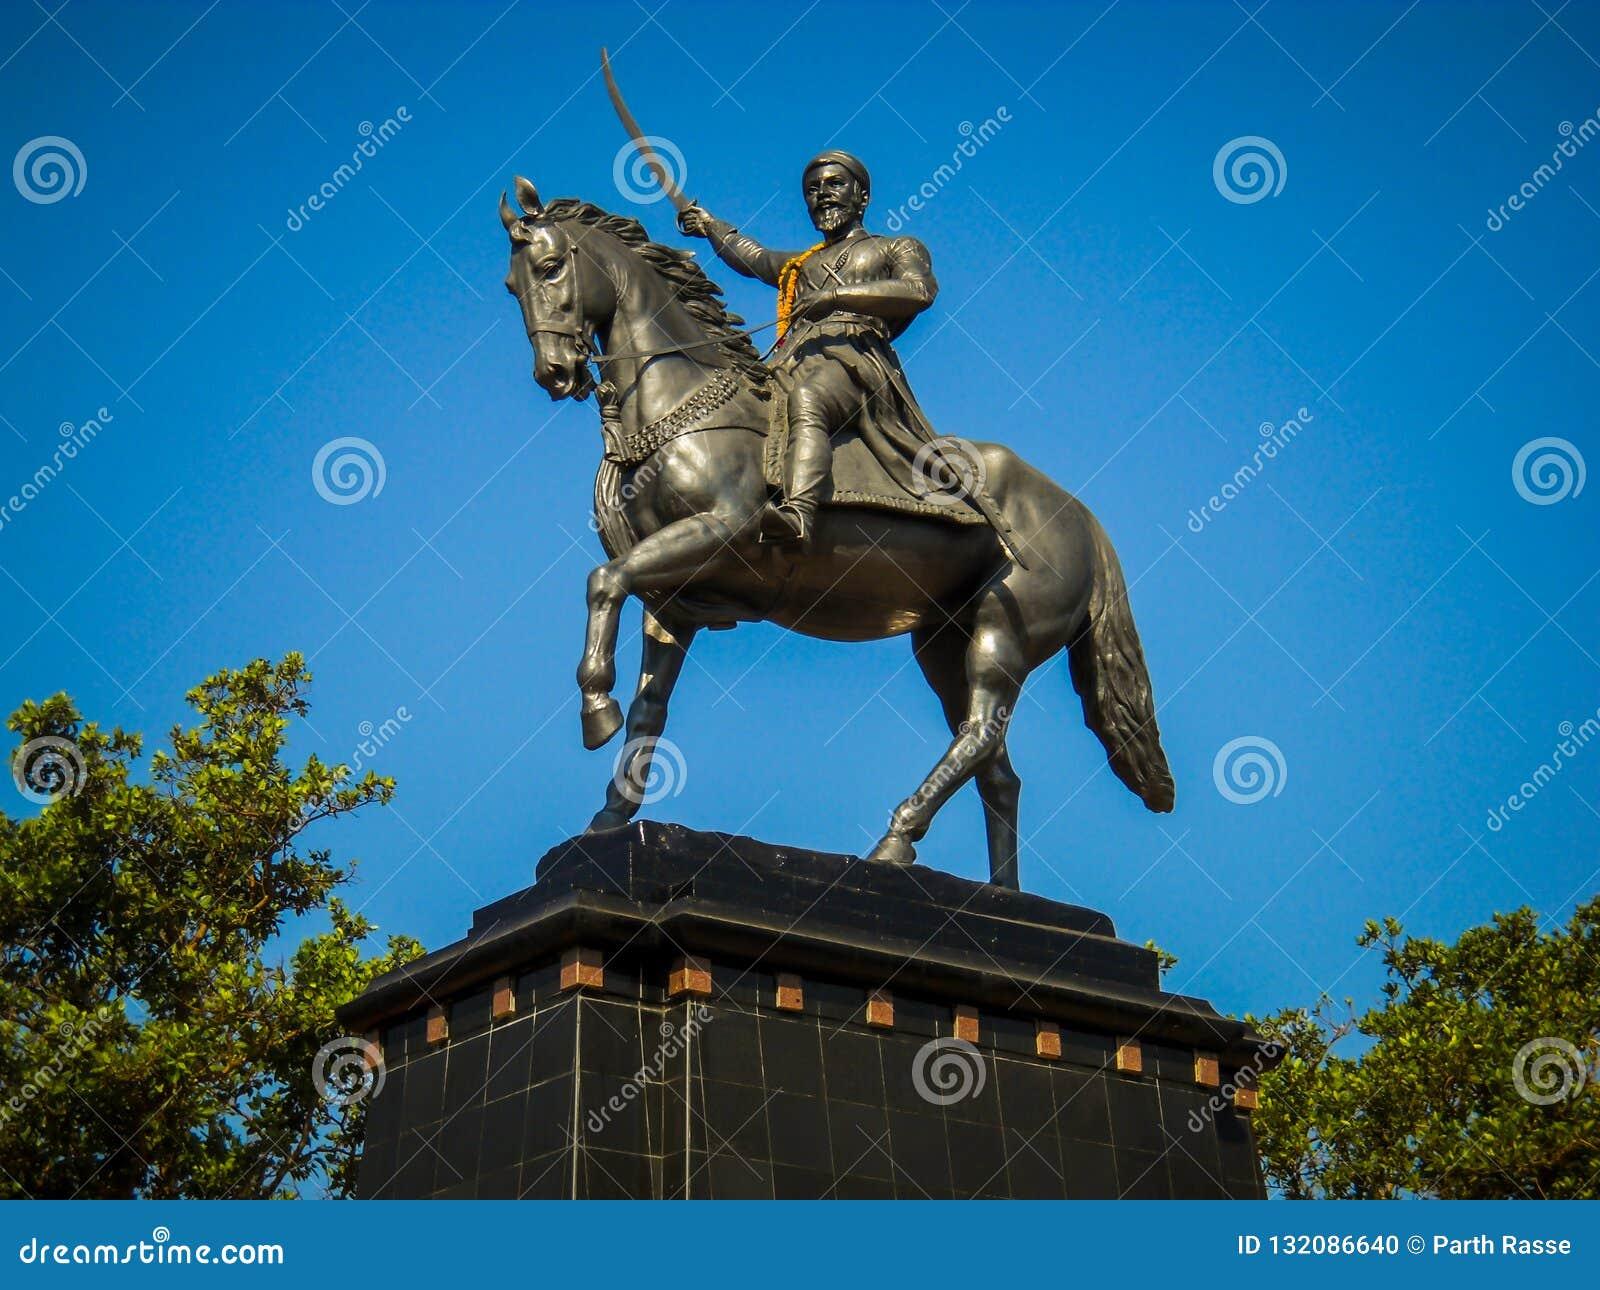 Statue of the king shivaji, in Pune, Maharashtra, India